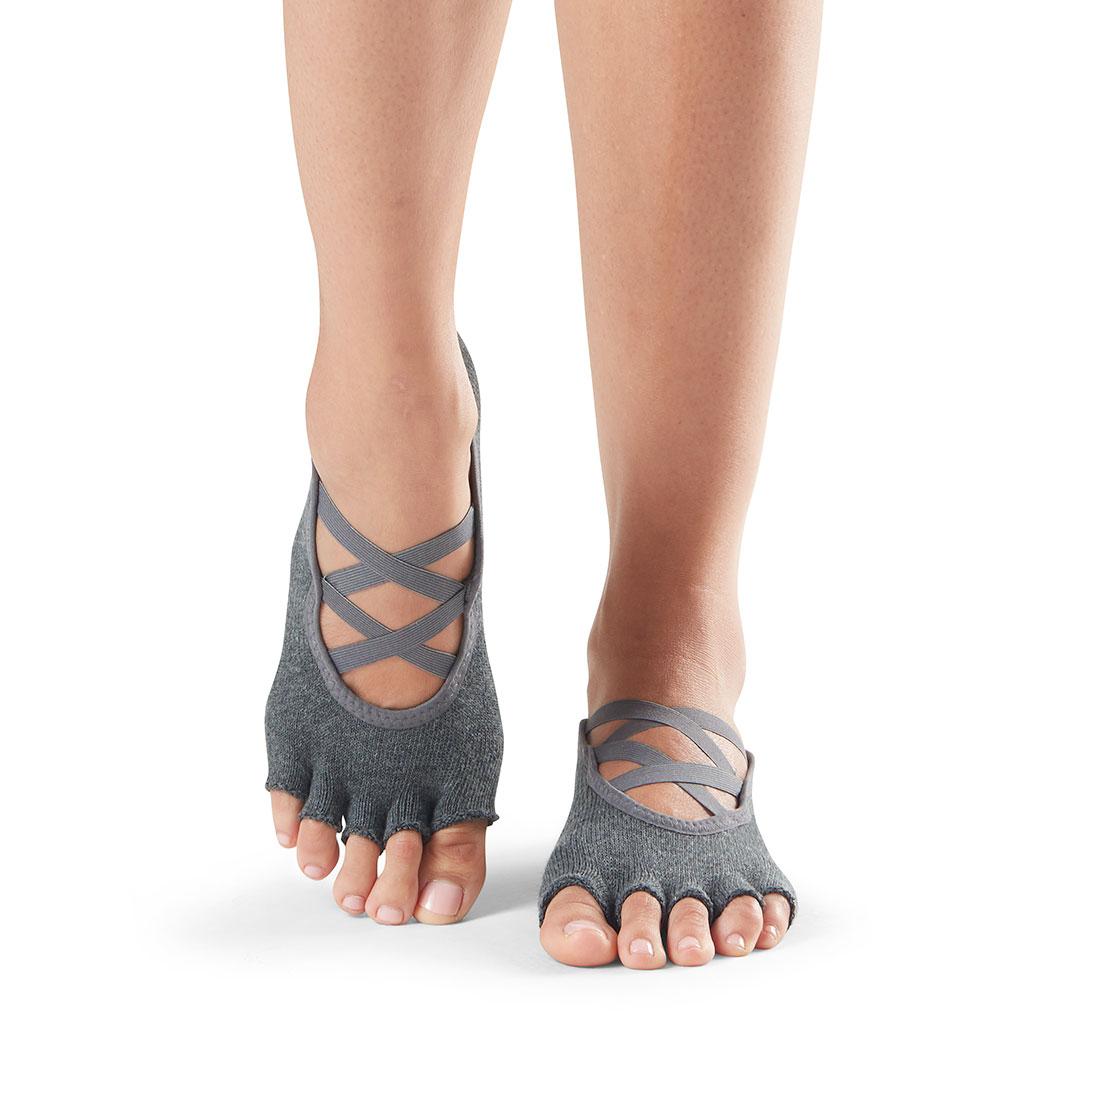 Yogasocke ToeSox Elle Half Toe Charcoal Grey - 1